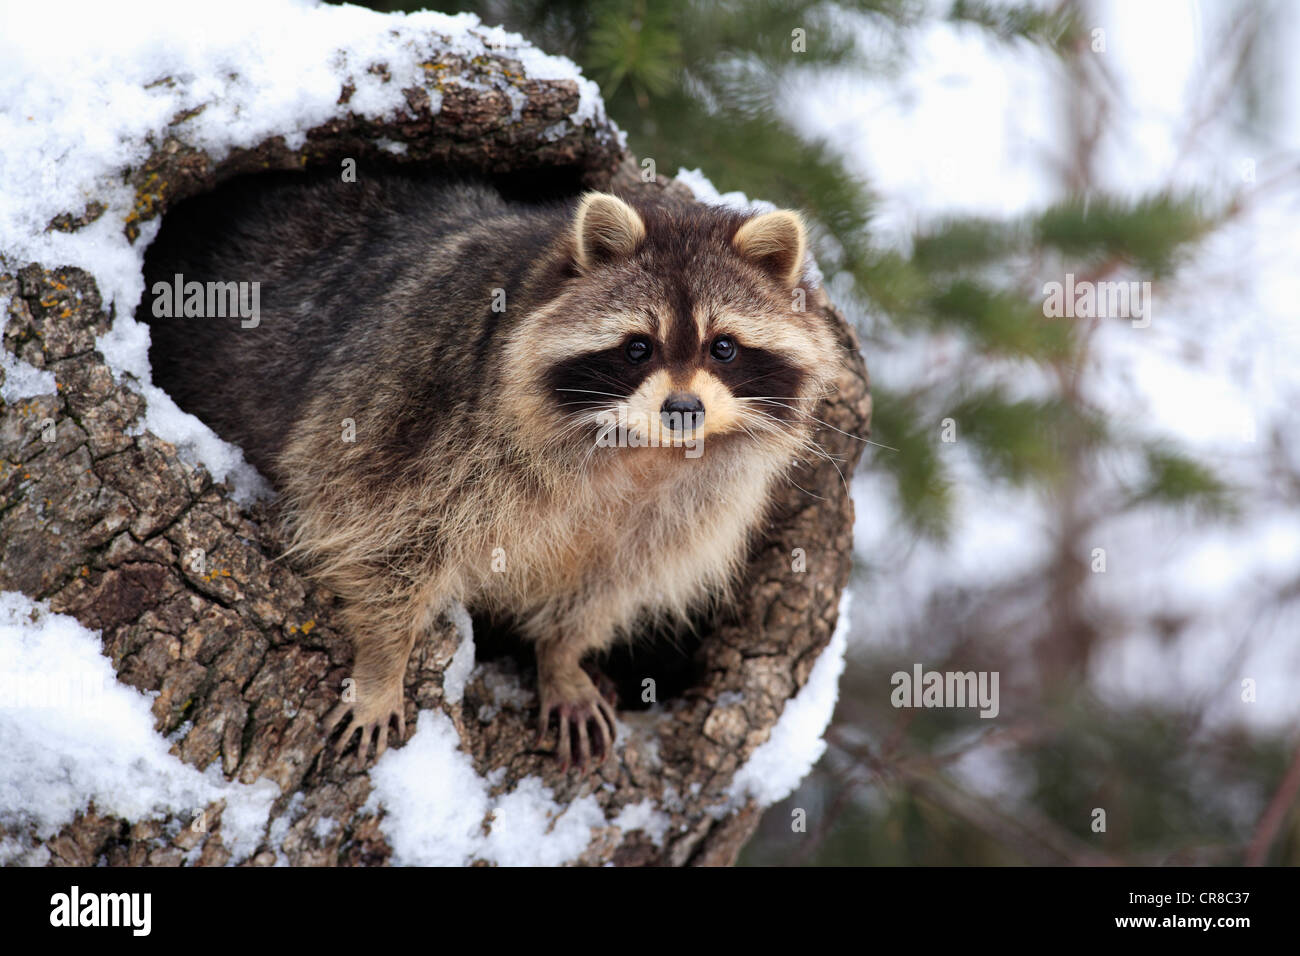 Raccoon (Procione lotor), neve, den, Montana, USA Immagini Stock